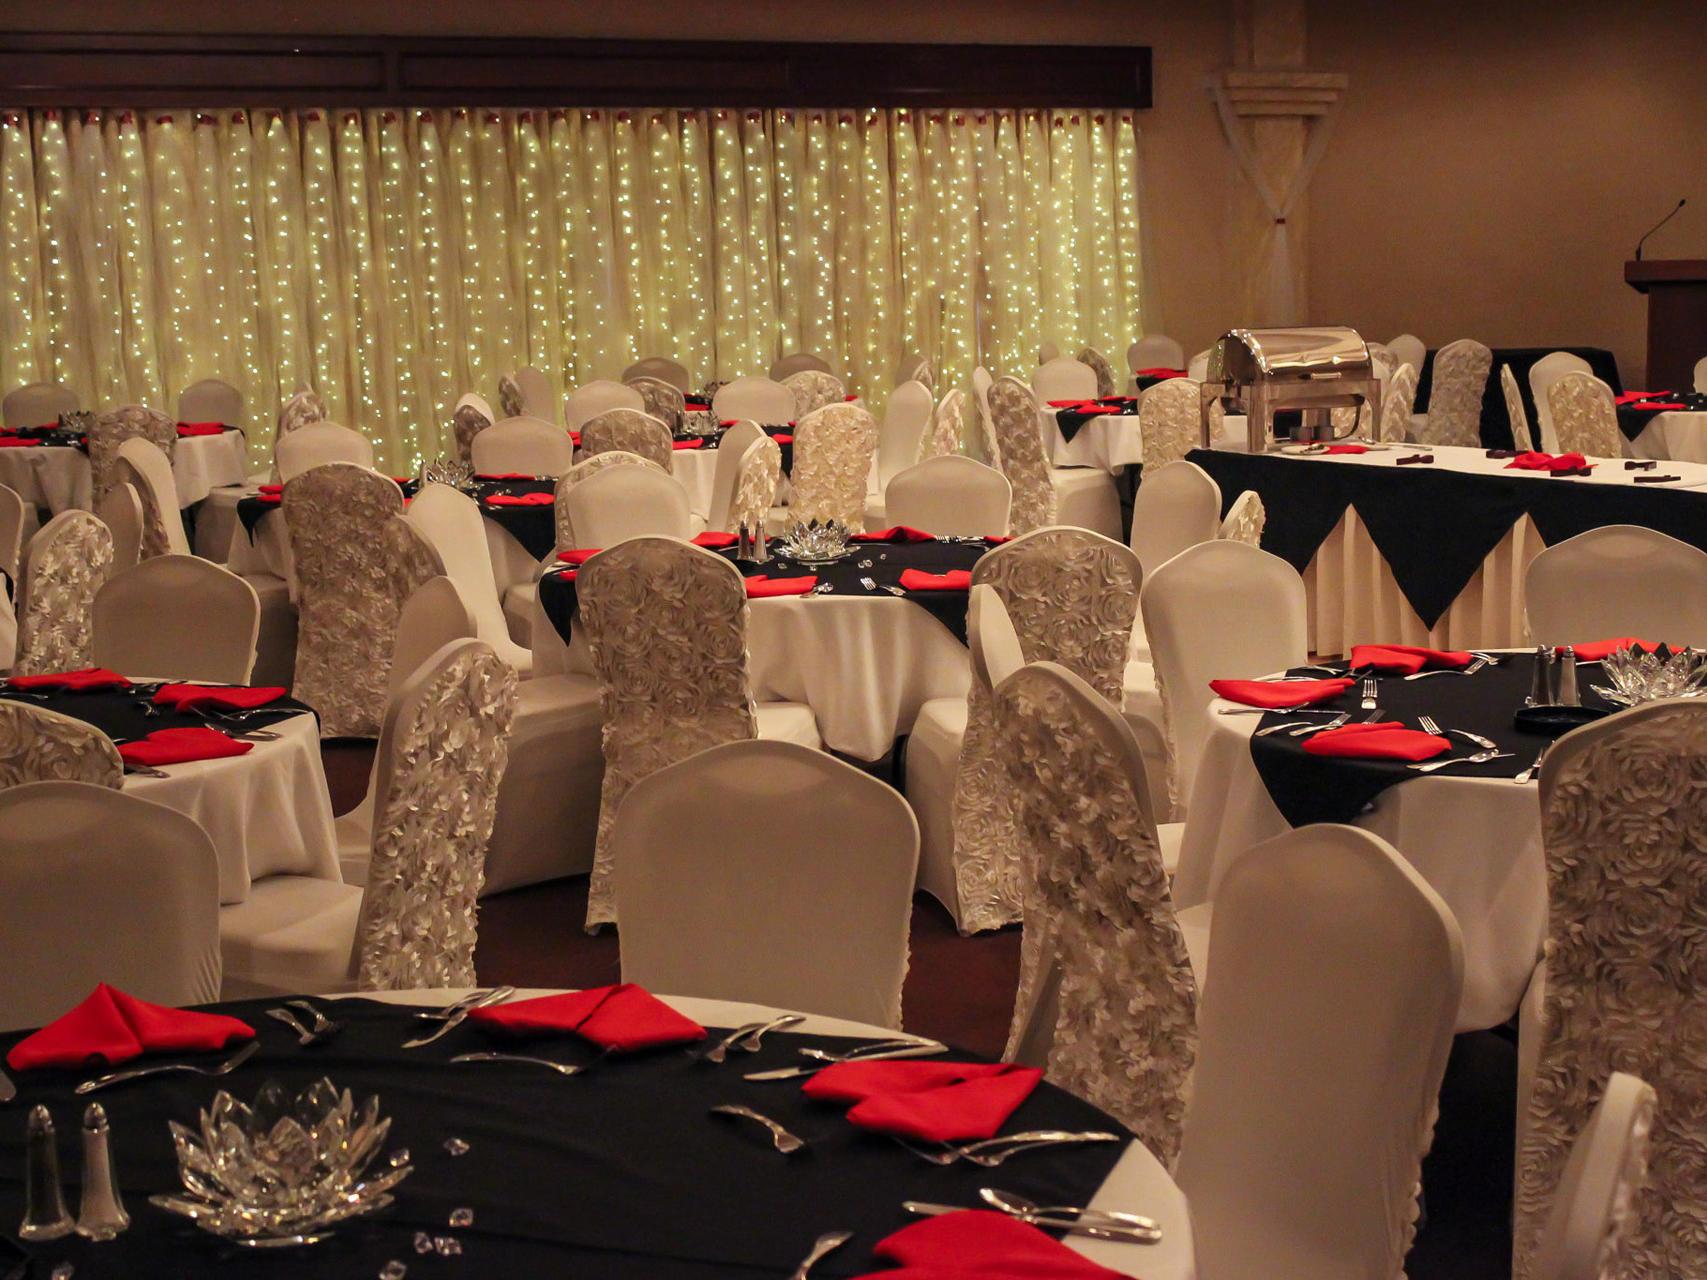 View of the spacious Borealis Ballroom at Wedgewood Resort